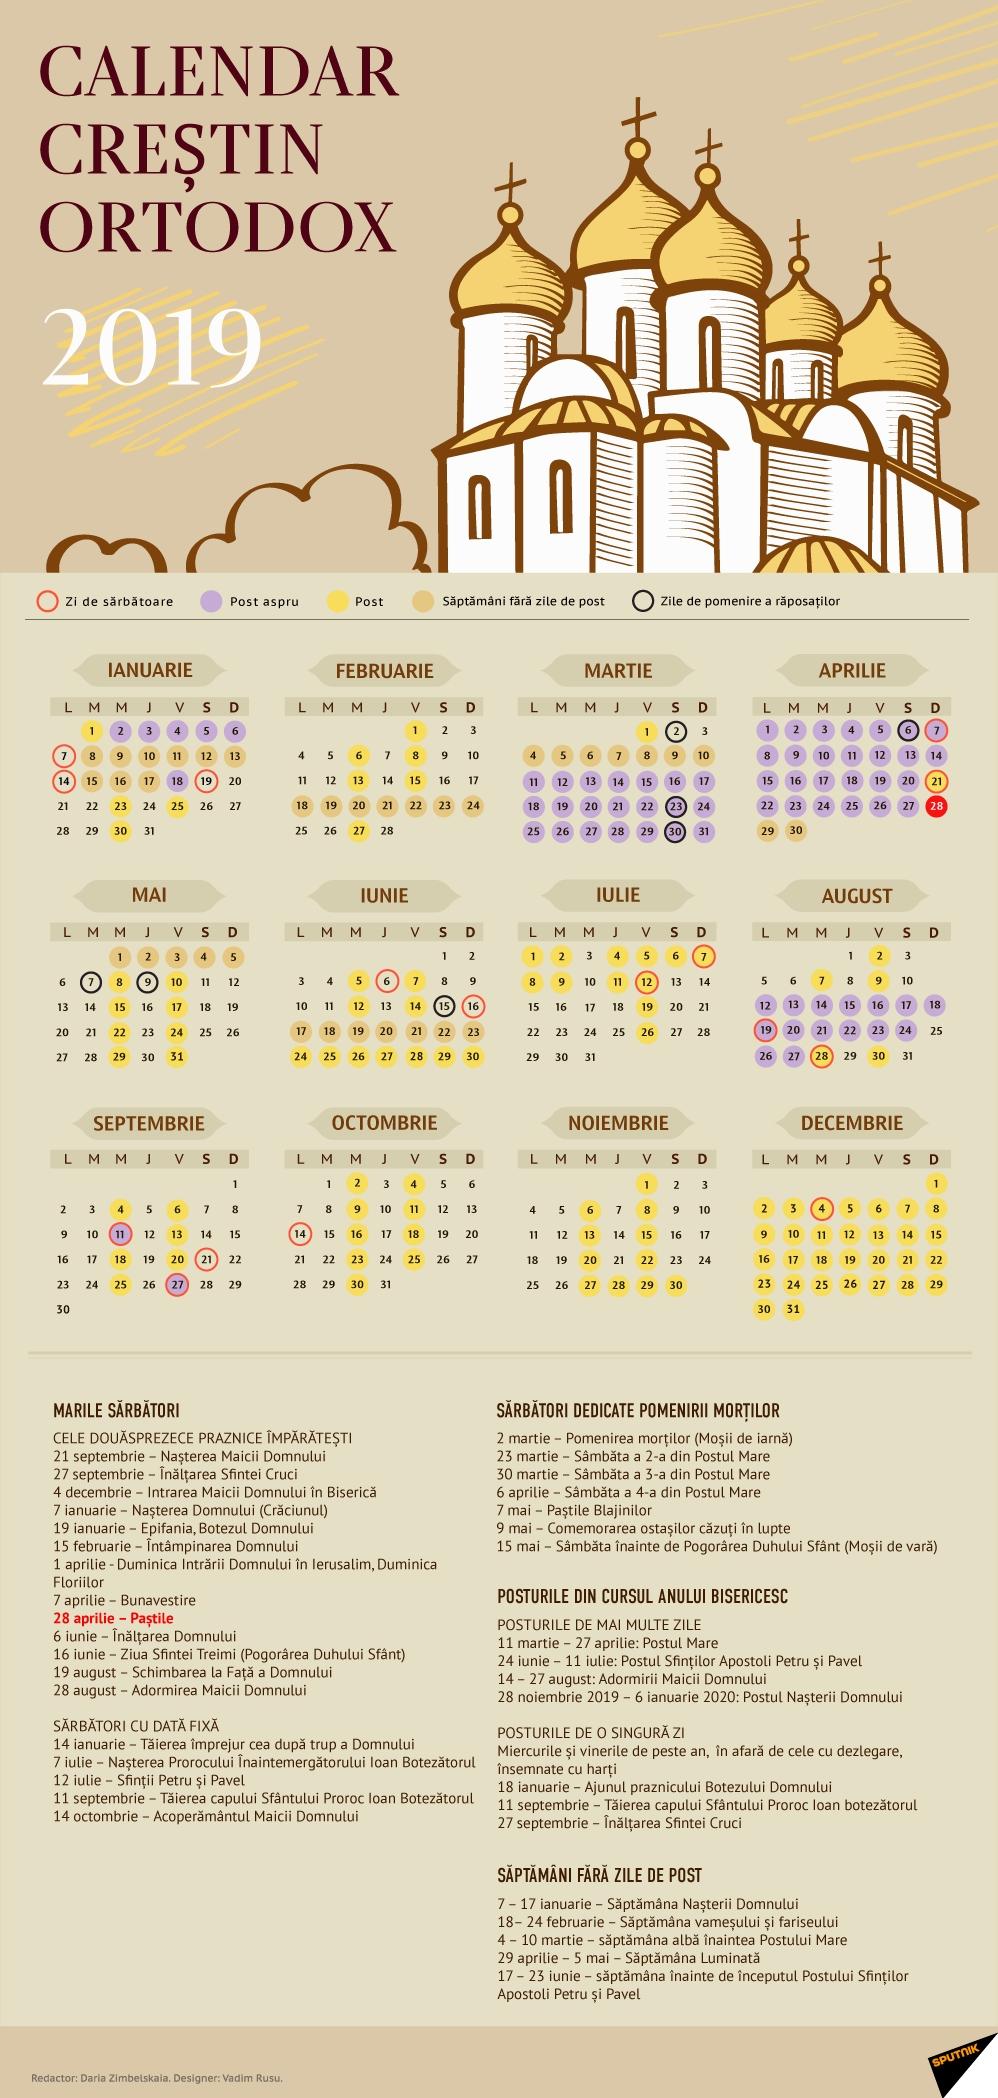 Calendar Creștin Ortodox 2019 – Stil Vechi 8 Iunie 2019 Calendar Ortodox